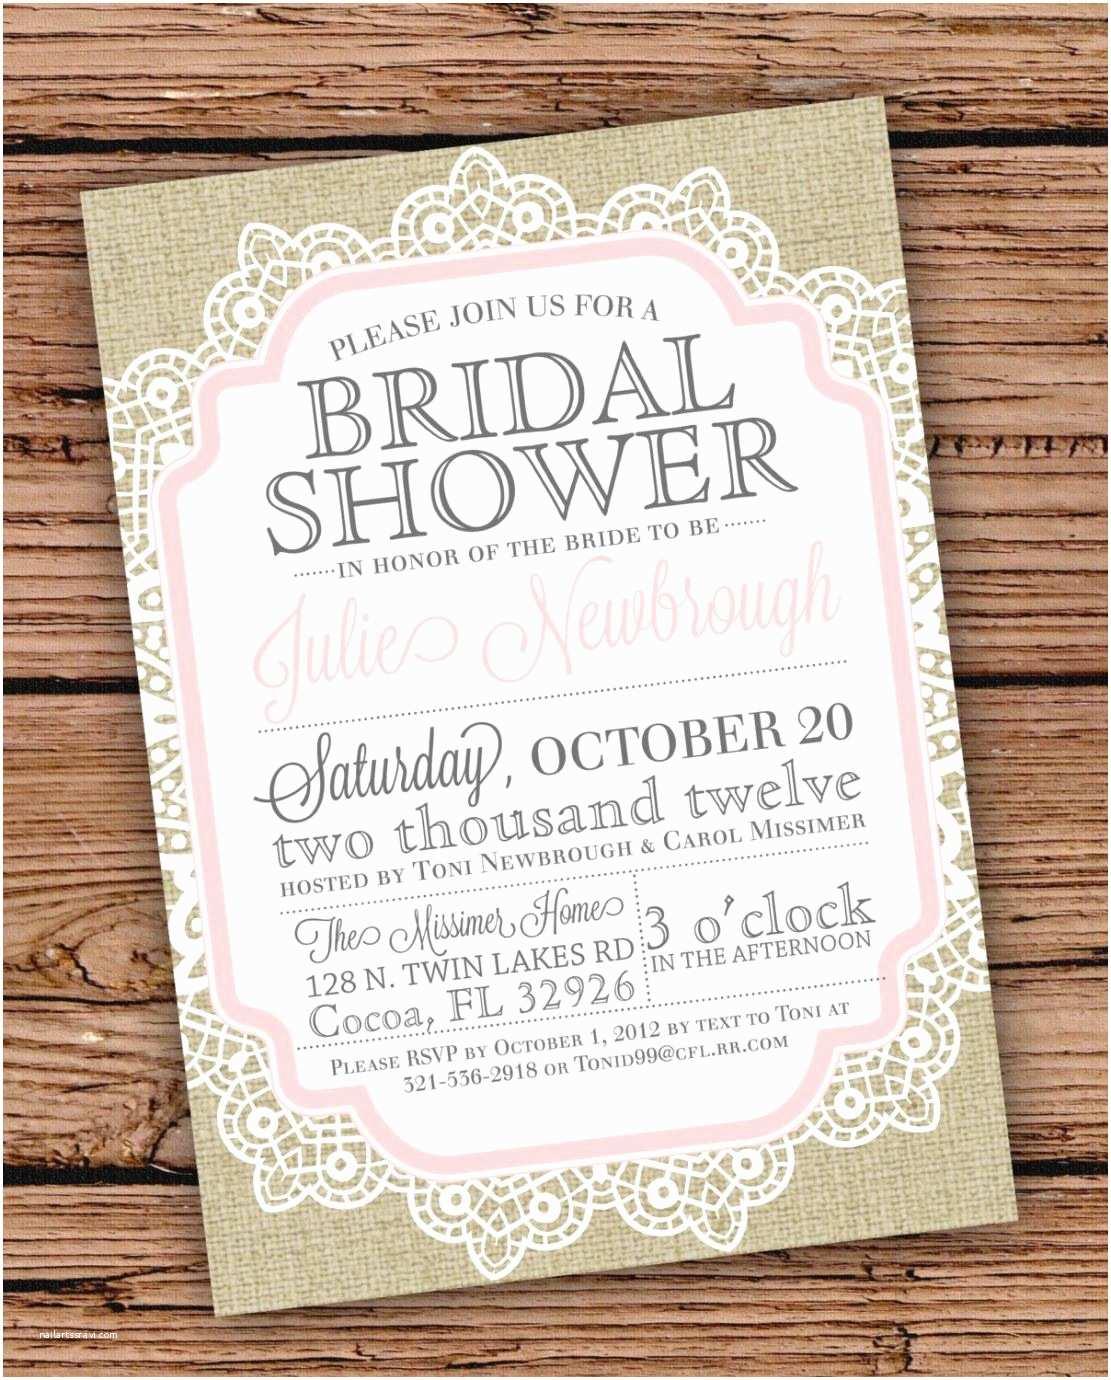 Michaels Do It Yourself Wedding Invitations Diy Bridal Shower Invitations Michaels Handmade Bridal